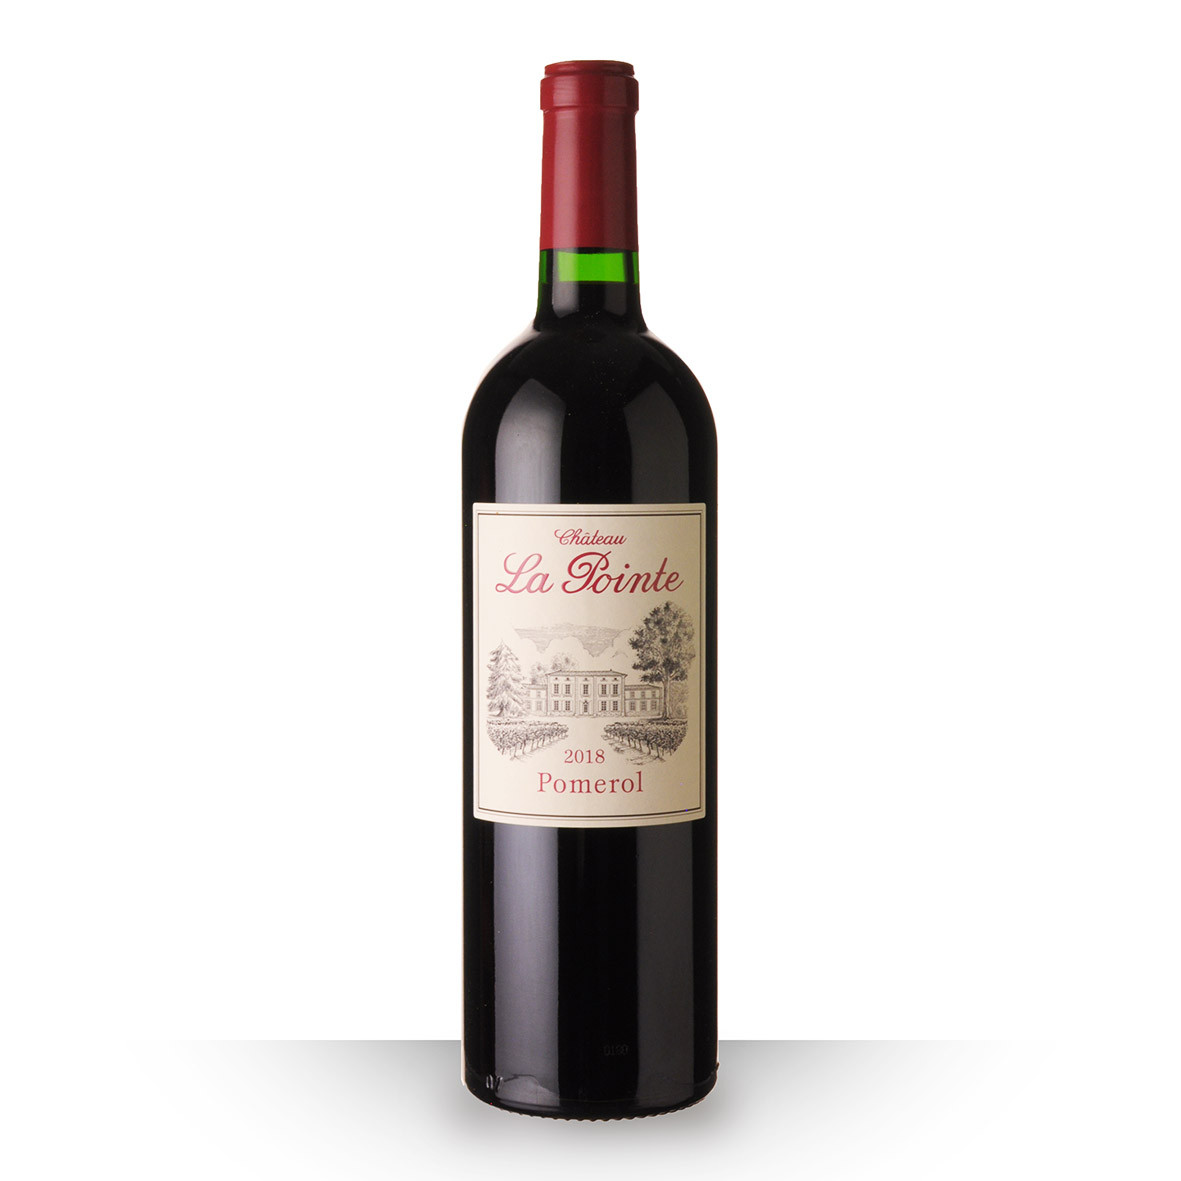 Château la Pointe Pomerol Rouge 2018 75cl www.odyssee-vins.com